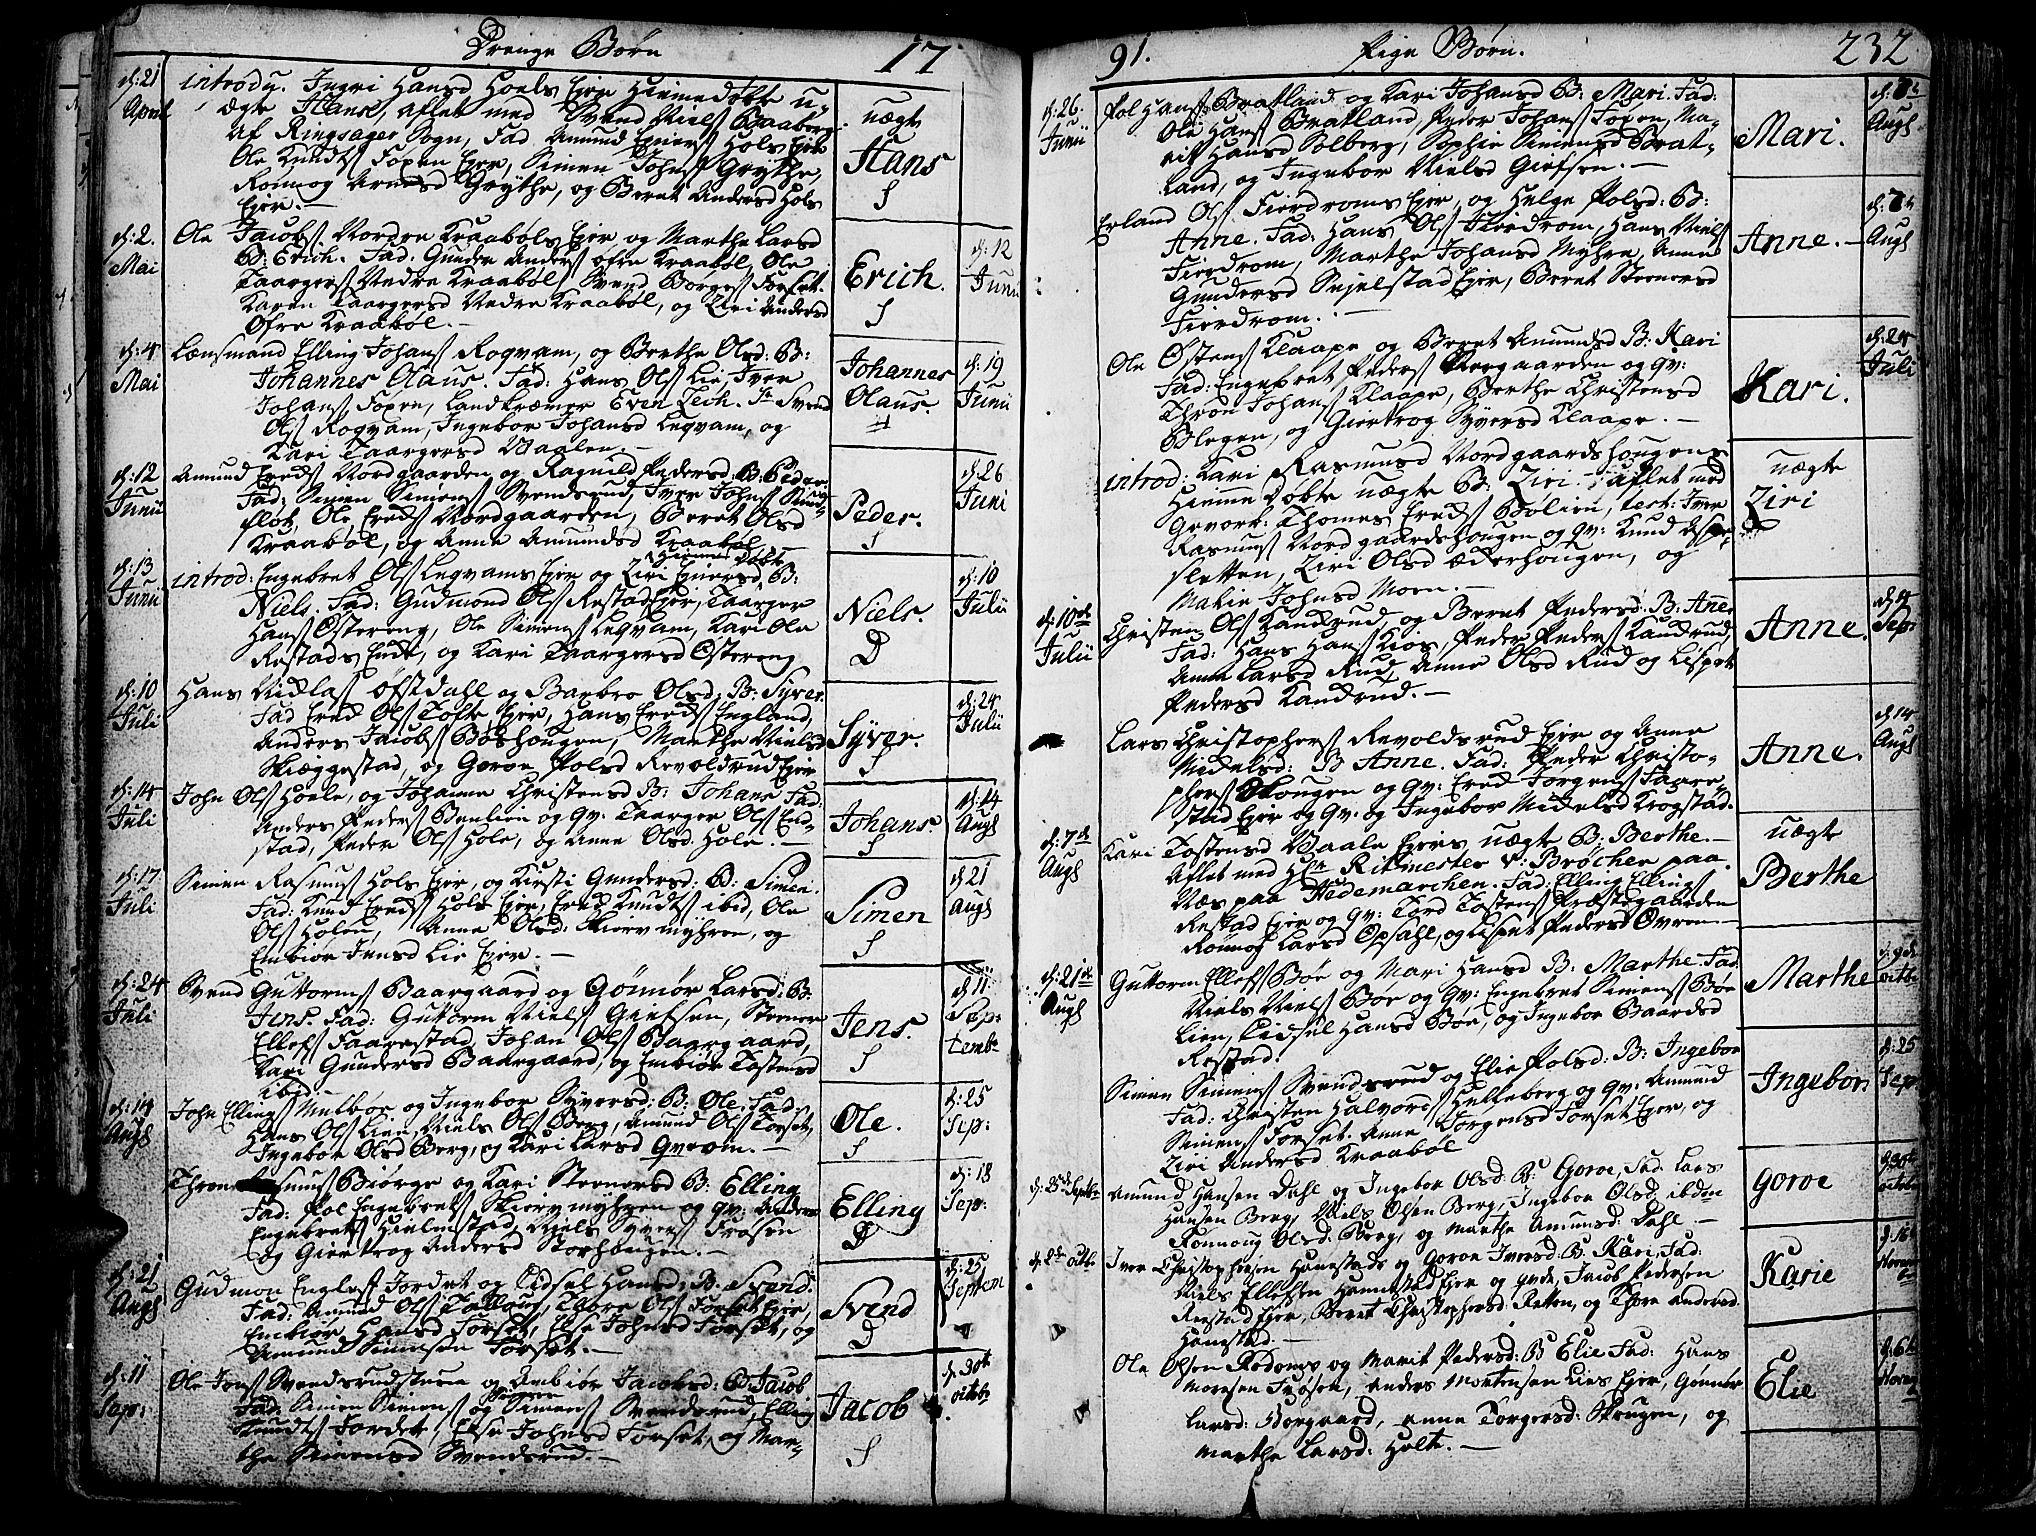 SAH, Gausdal prestekontor, Ministerialbok nr. 3, 1758-1809, s. 232